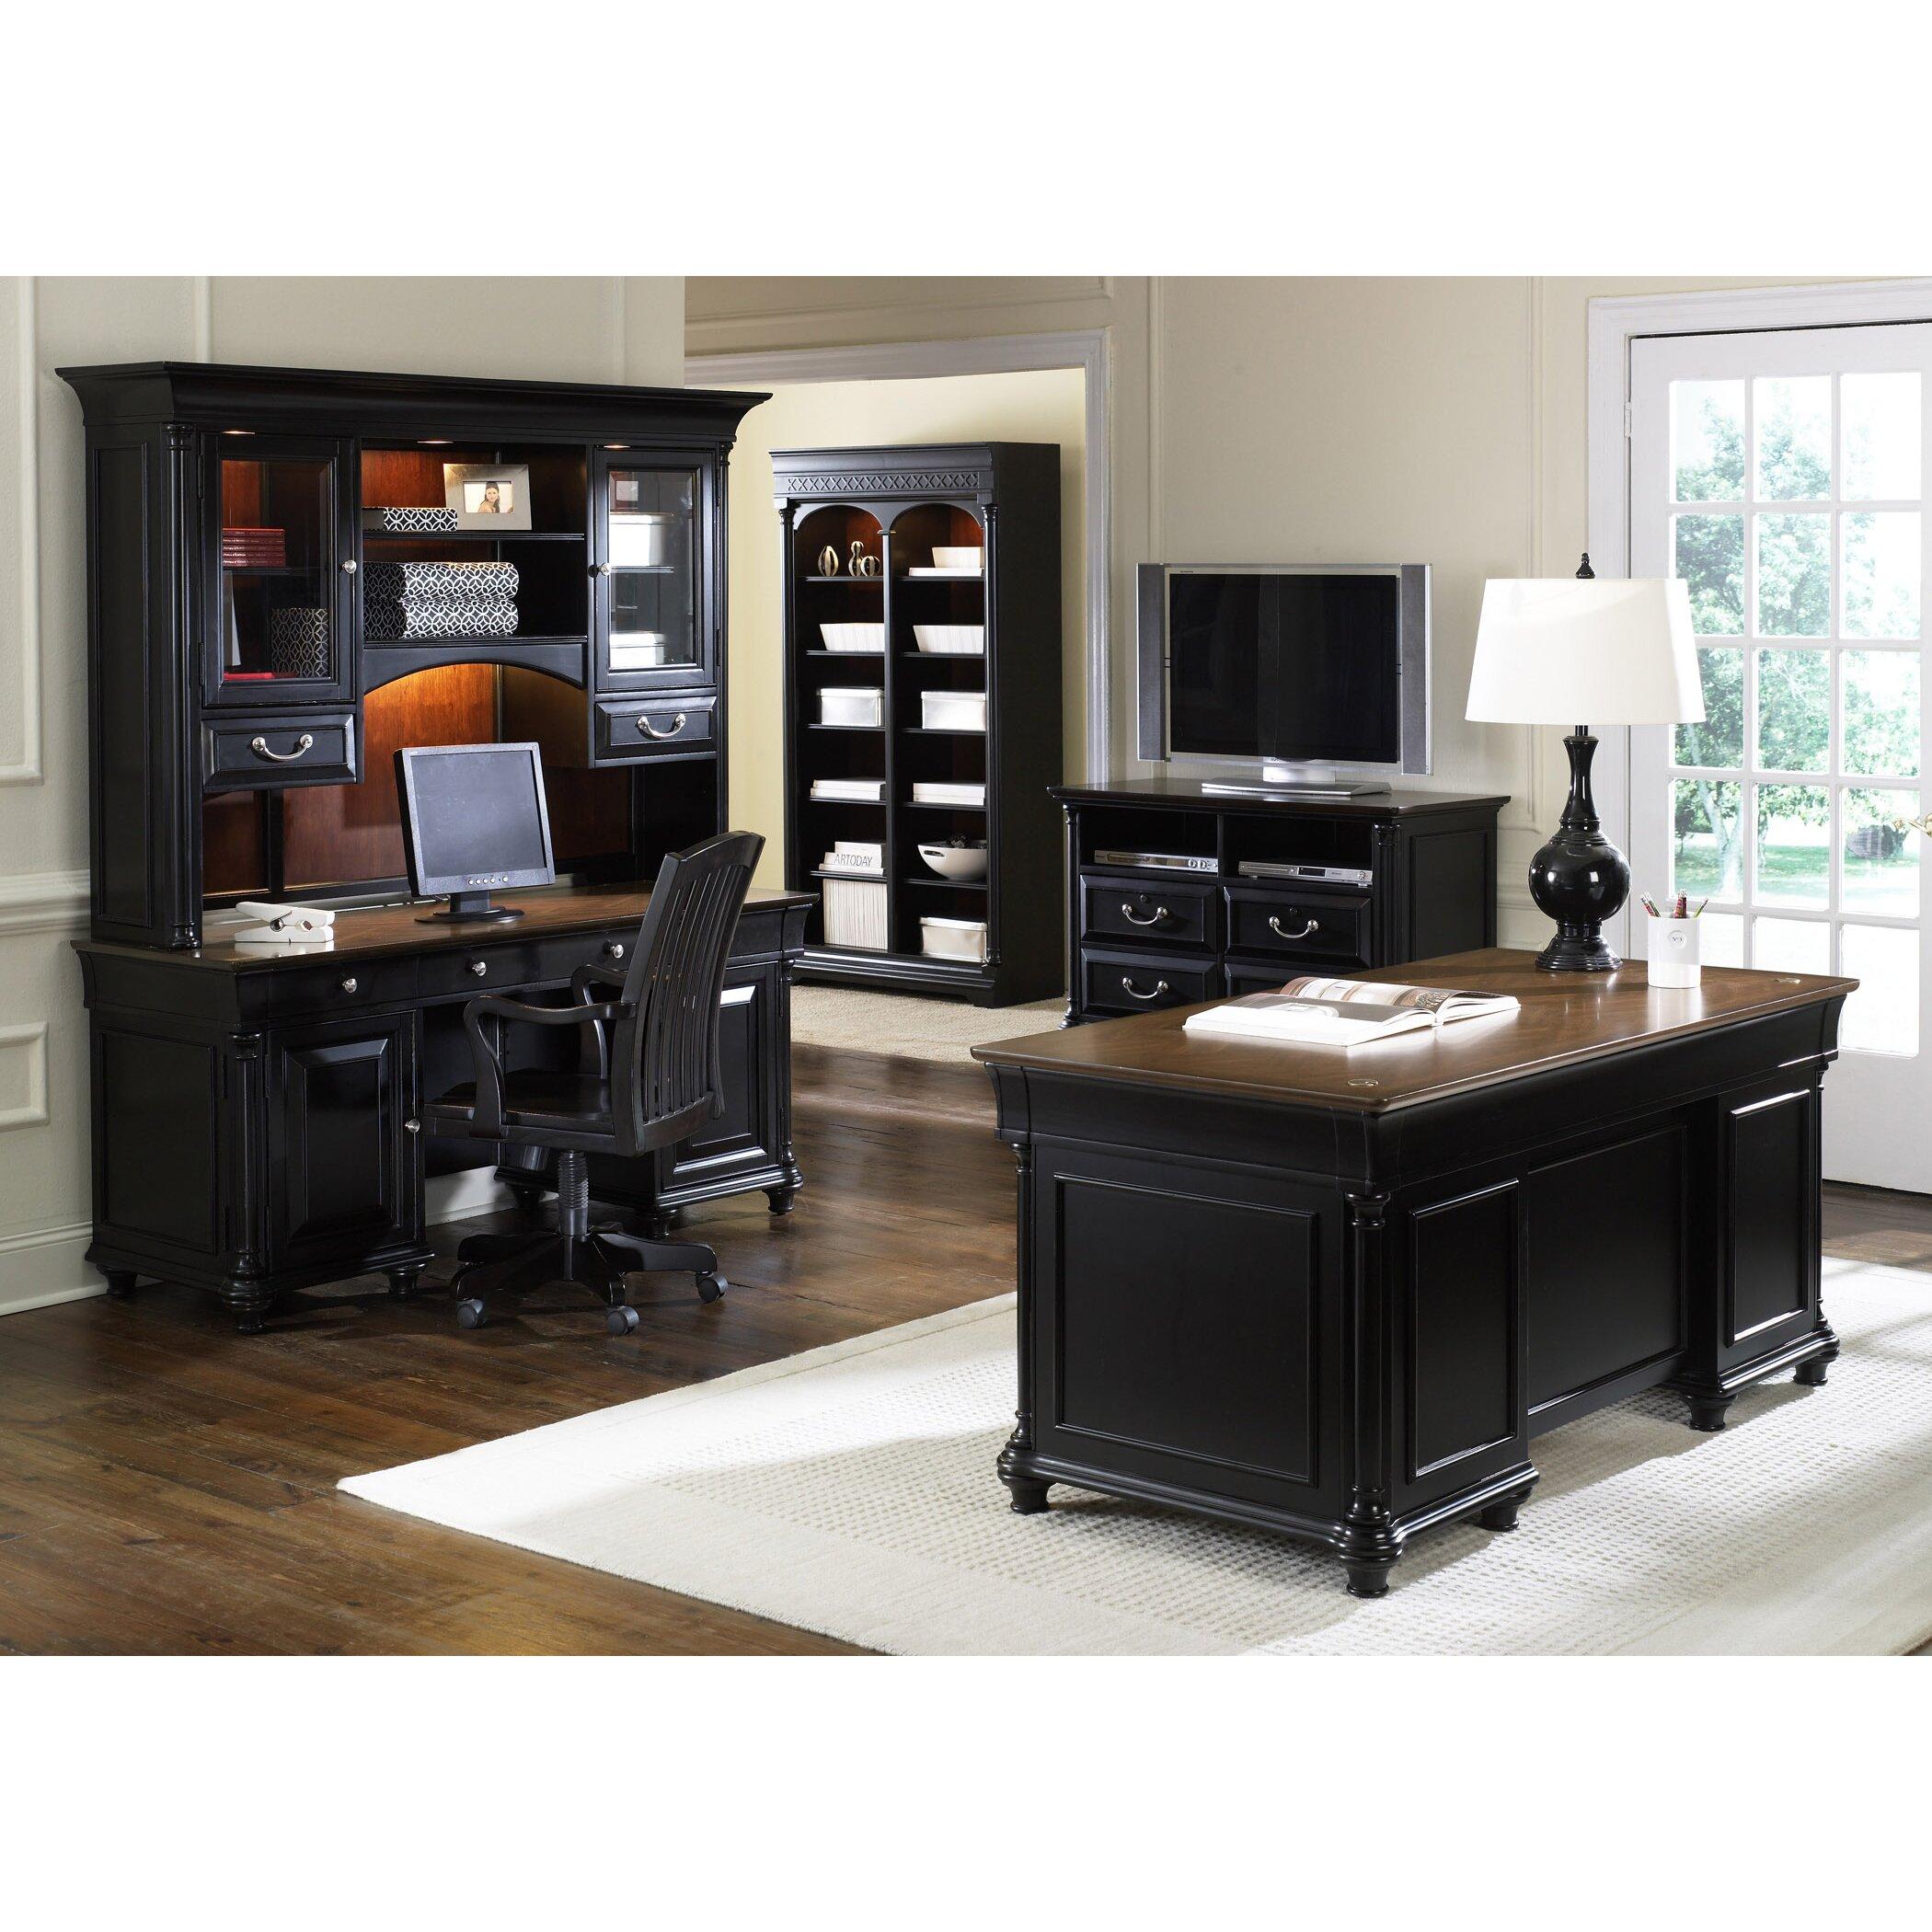 Liberty Furniture St. Ives 5-Piece Standard Desk Office